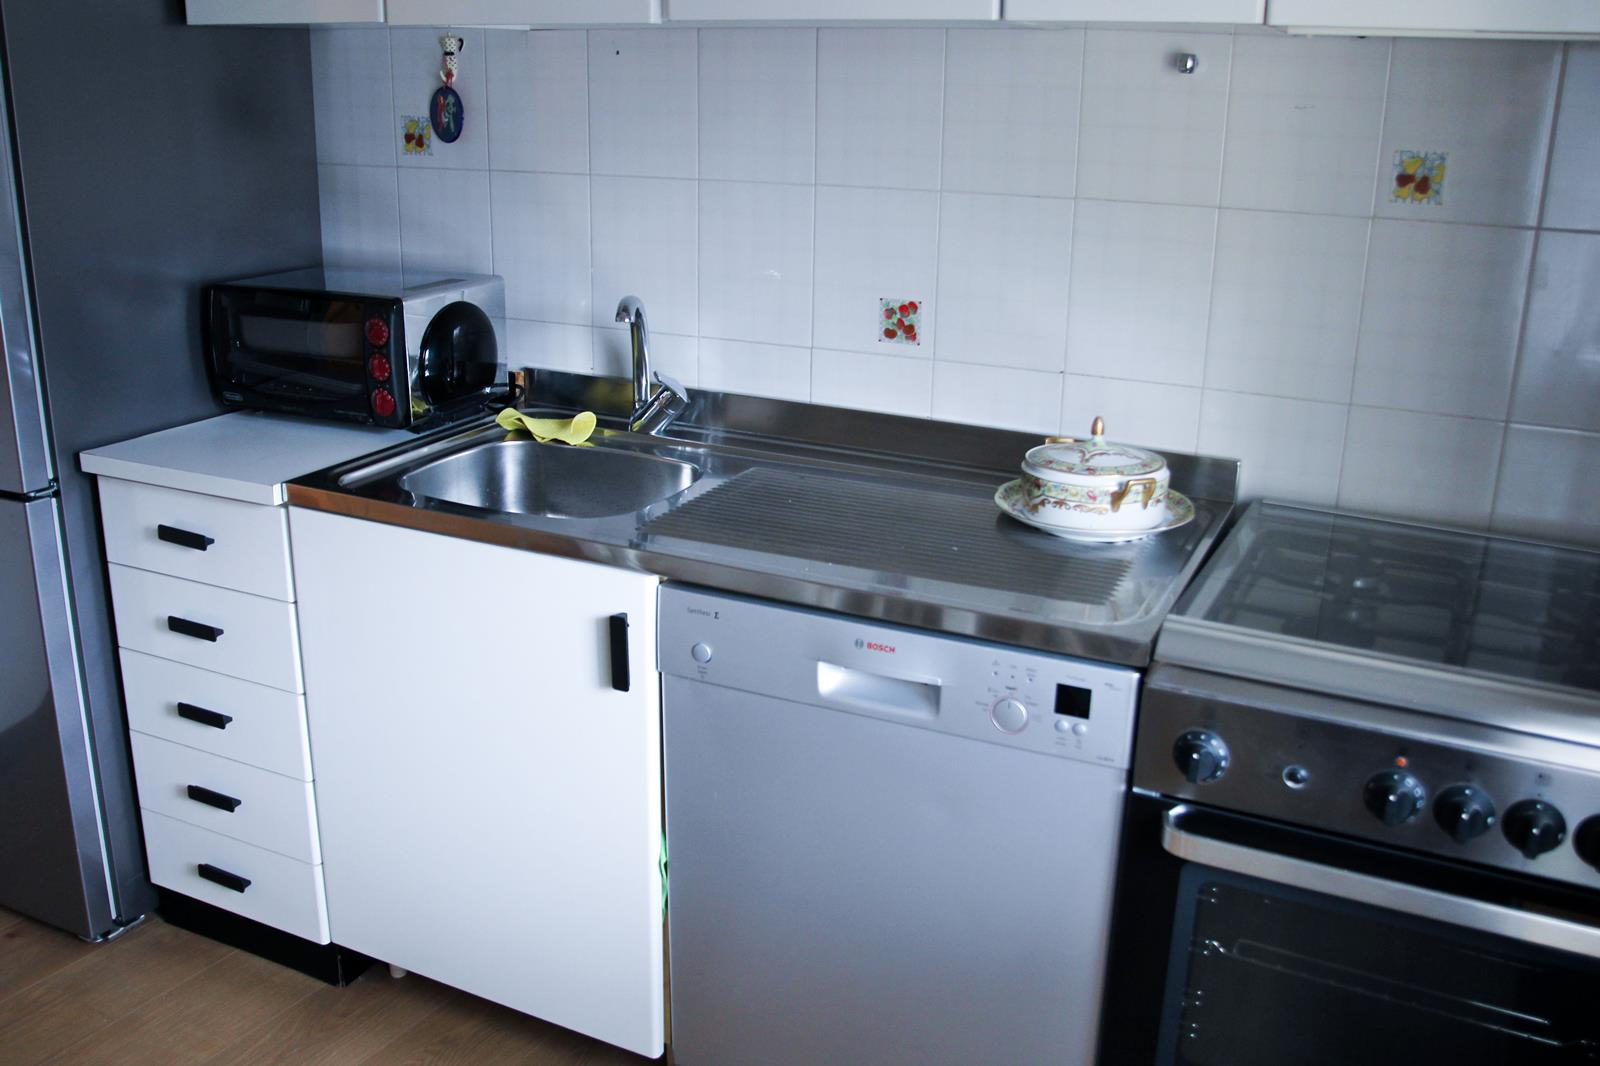 cucina 1 b b villa carrara